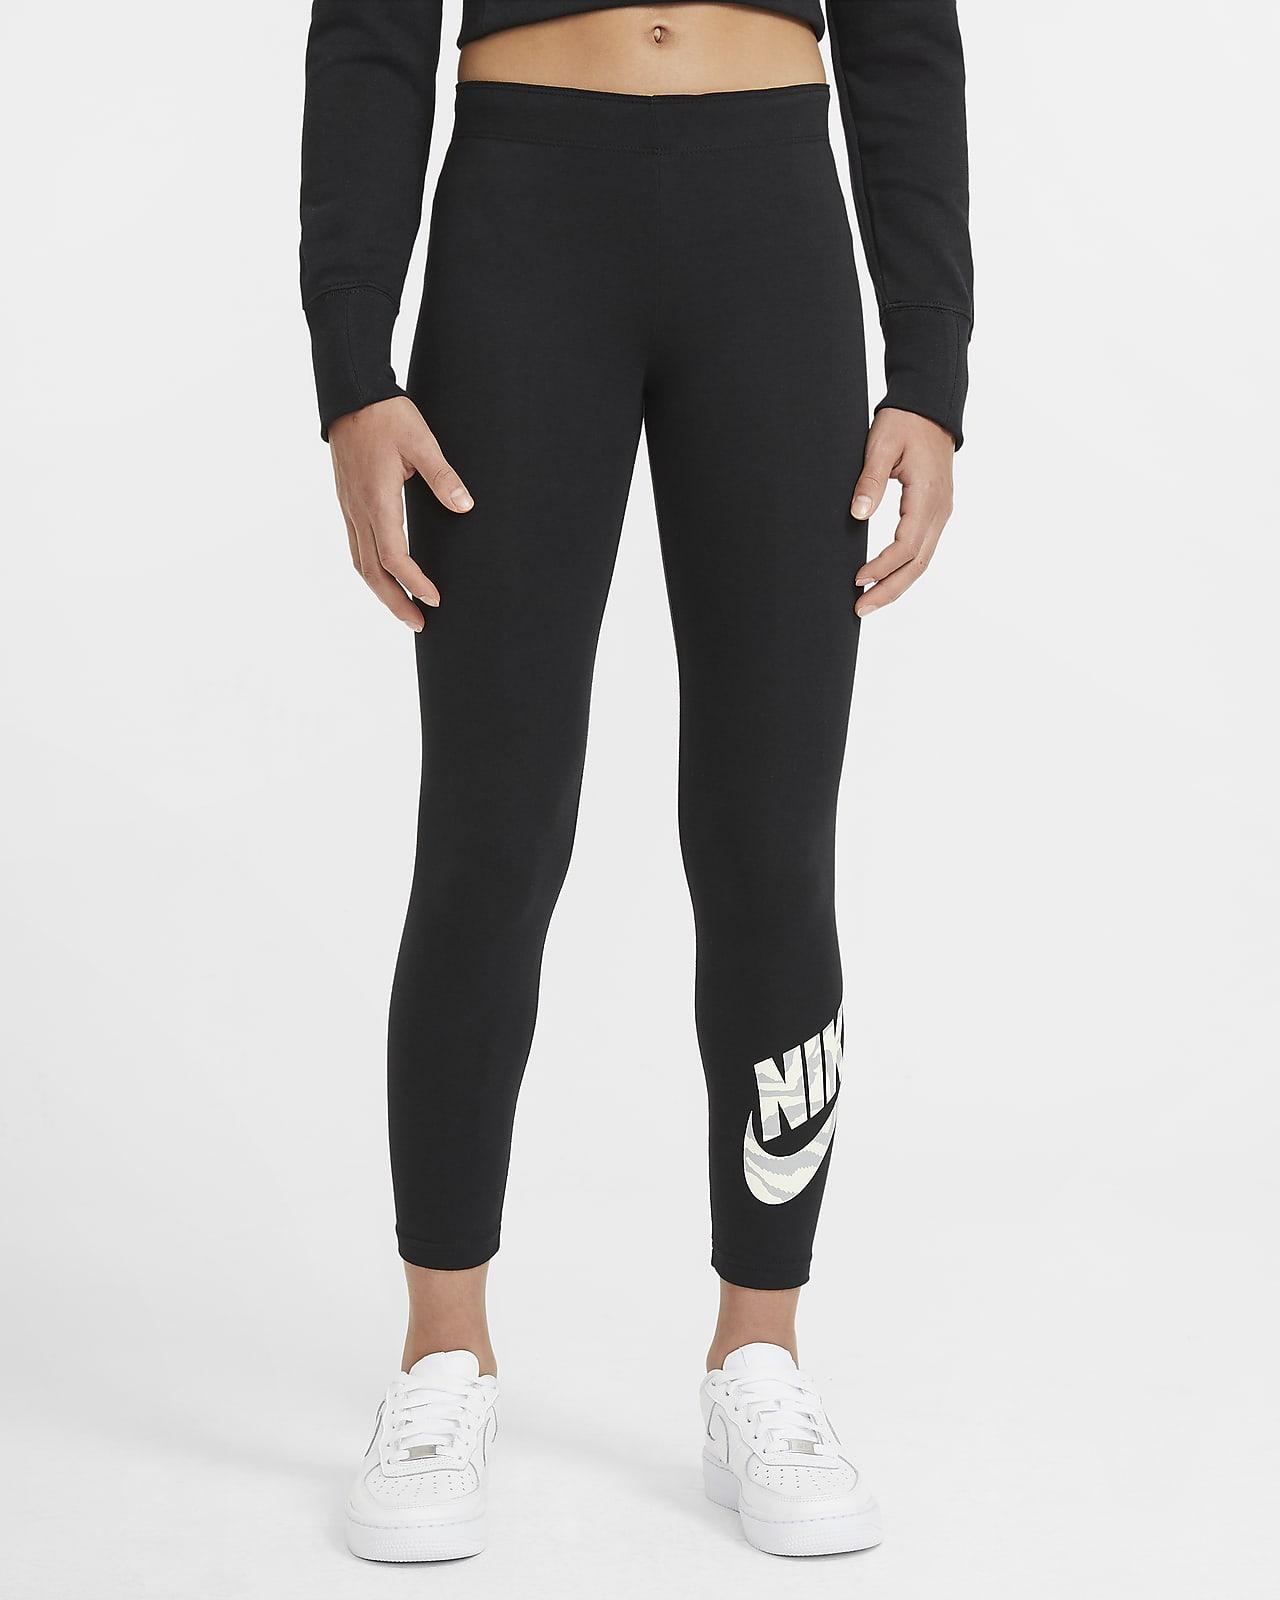 Legging à motif Nike Sportswear Favorites pour Fille plus âgée